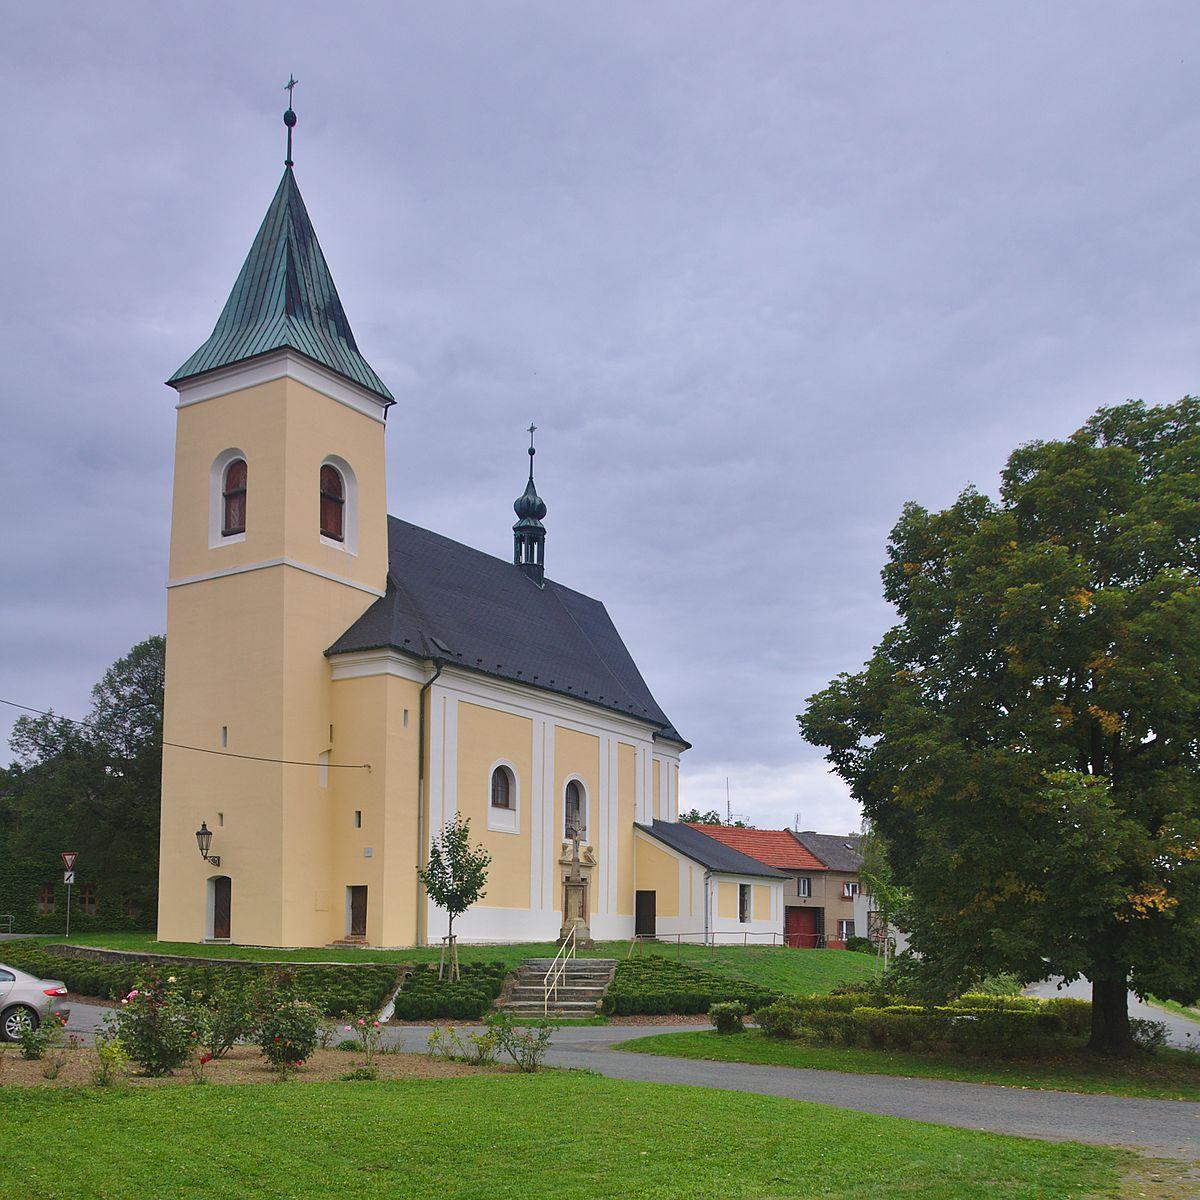 Stařechovice - Wikipedia, la enciclopedia libre